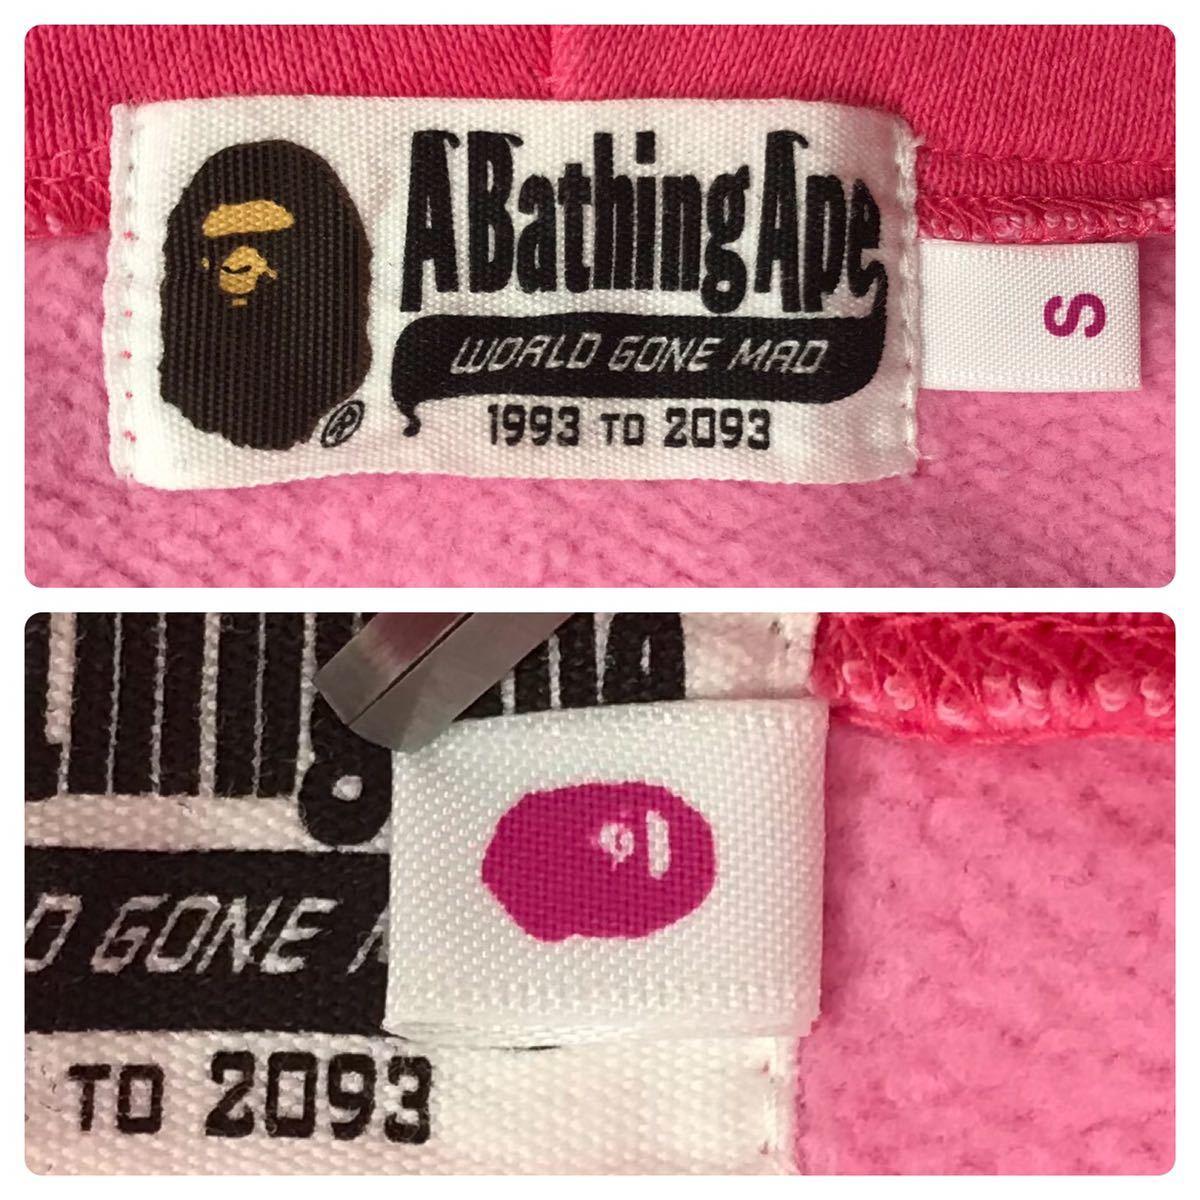 pink camo シャーク パーカー レディース Sサイズ shark full zip hoodie a bathing ape bape エイプ ベイプ アベイシングエイプ ピンク